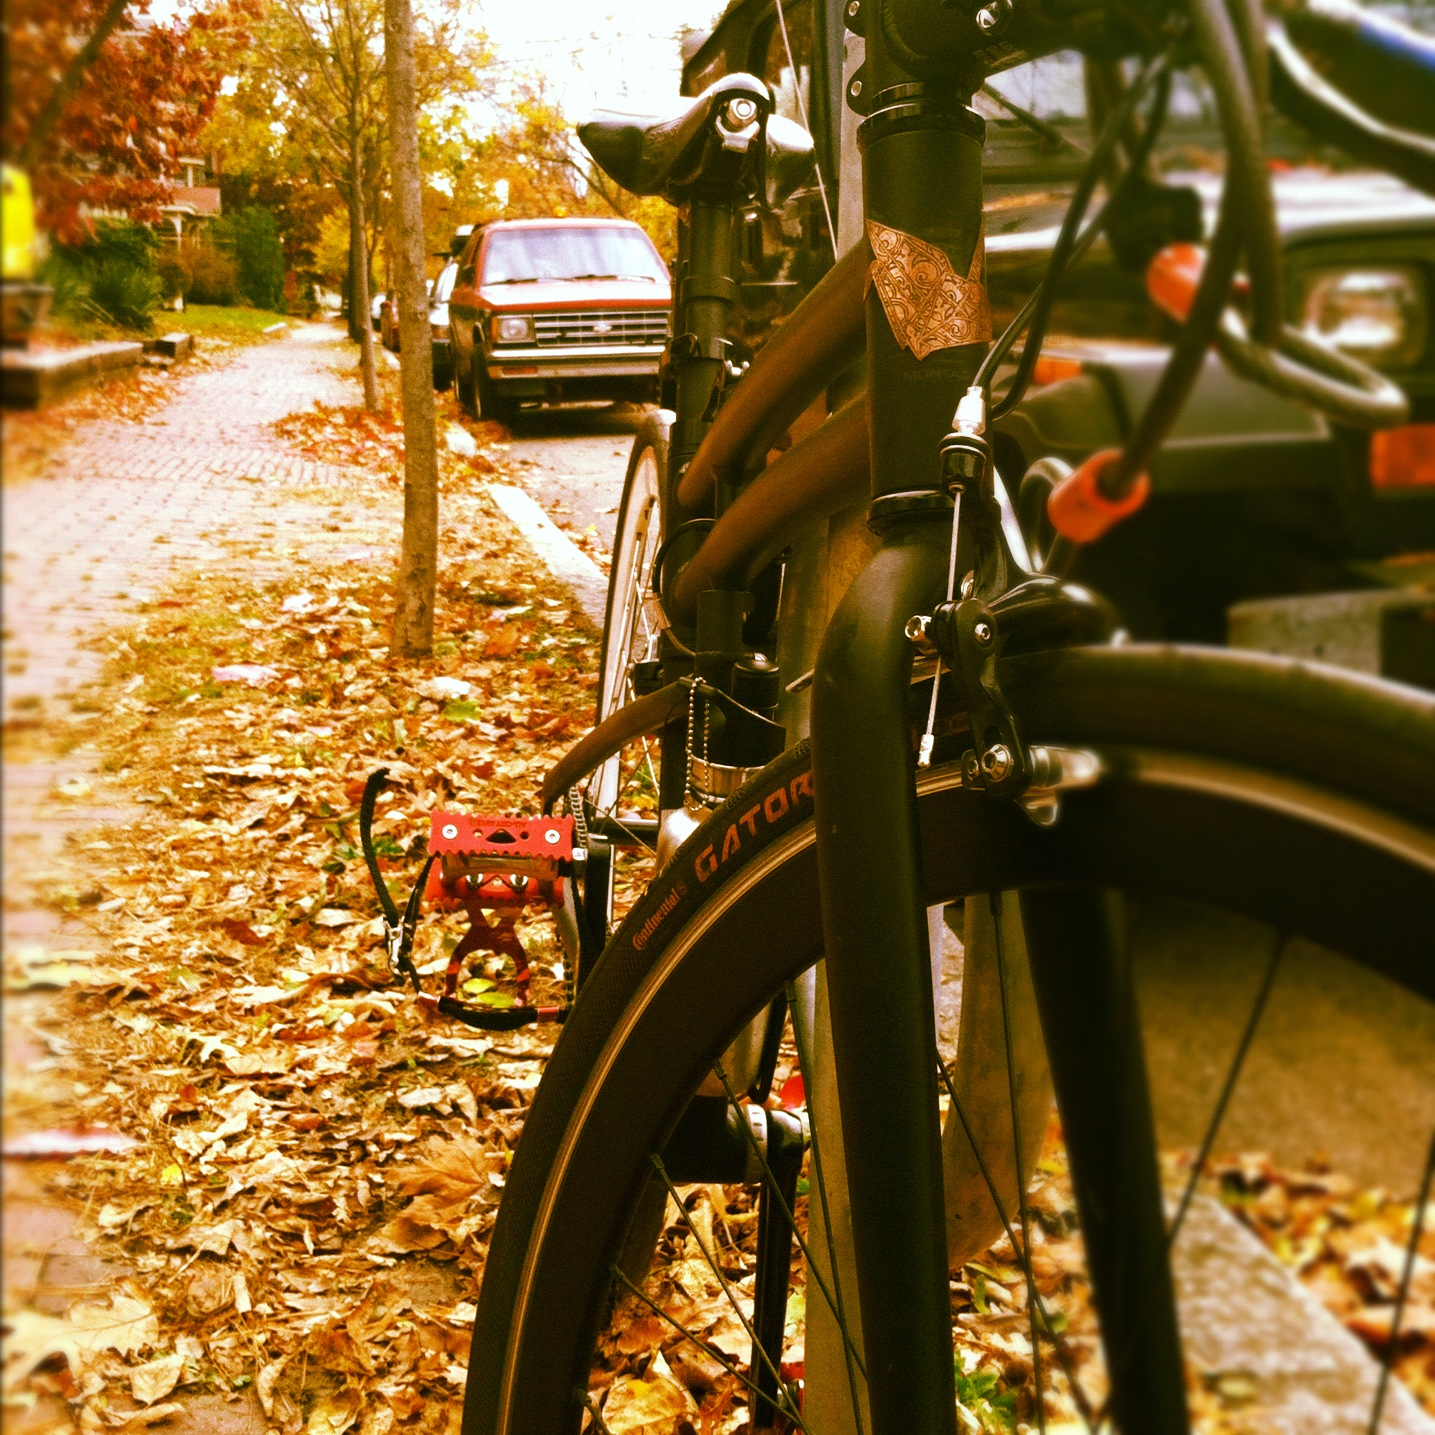 Montague folding bike adventure